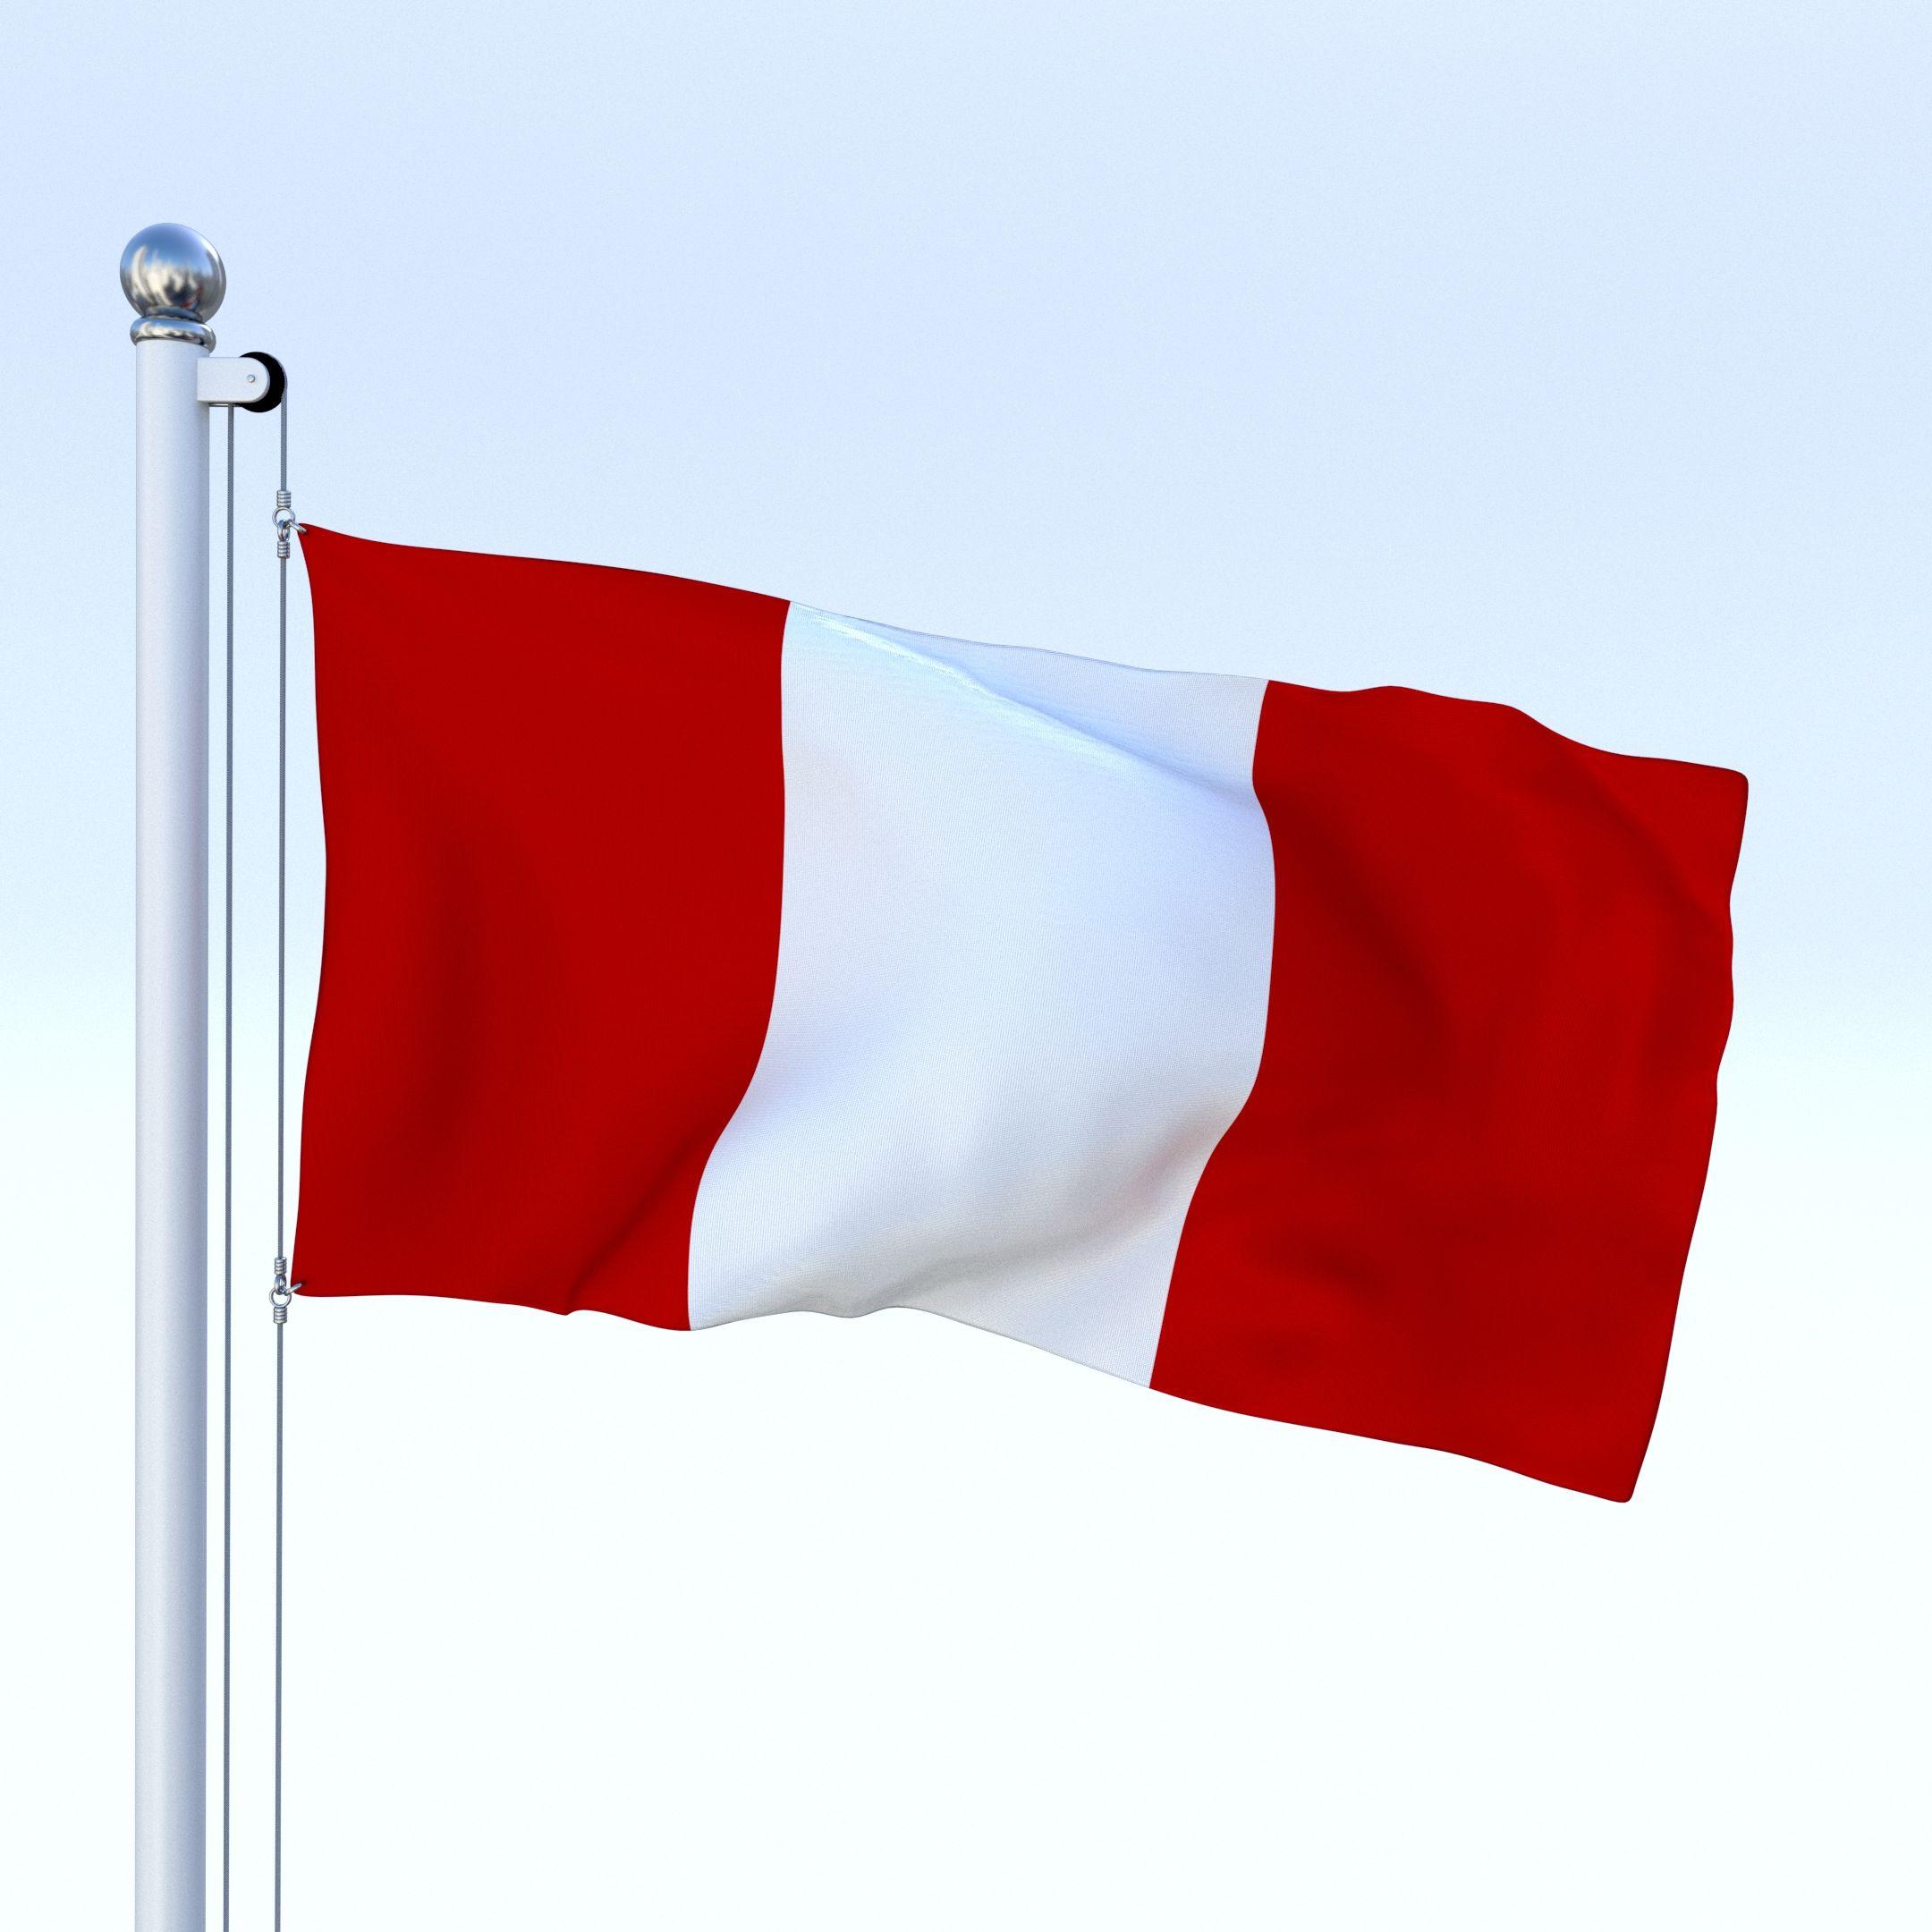 Animated Peru Flag Animated, Peru, Flag Belgium flag